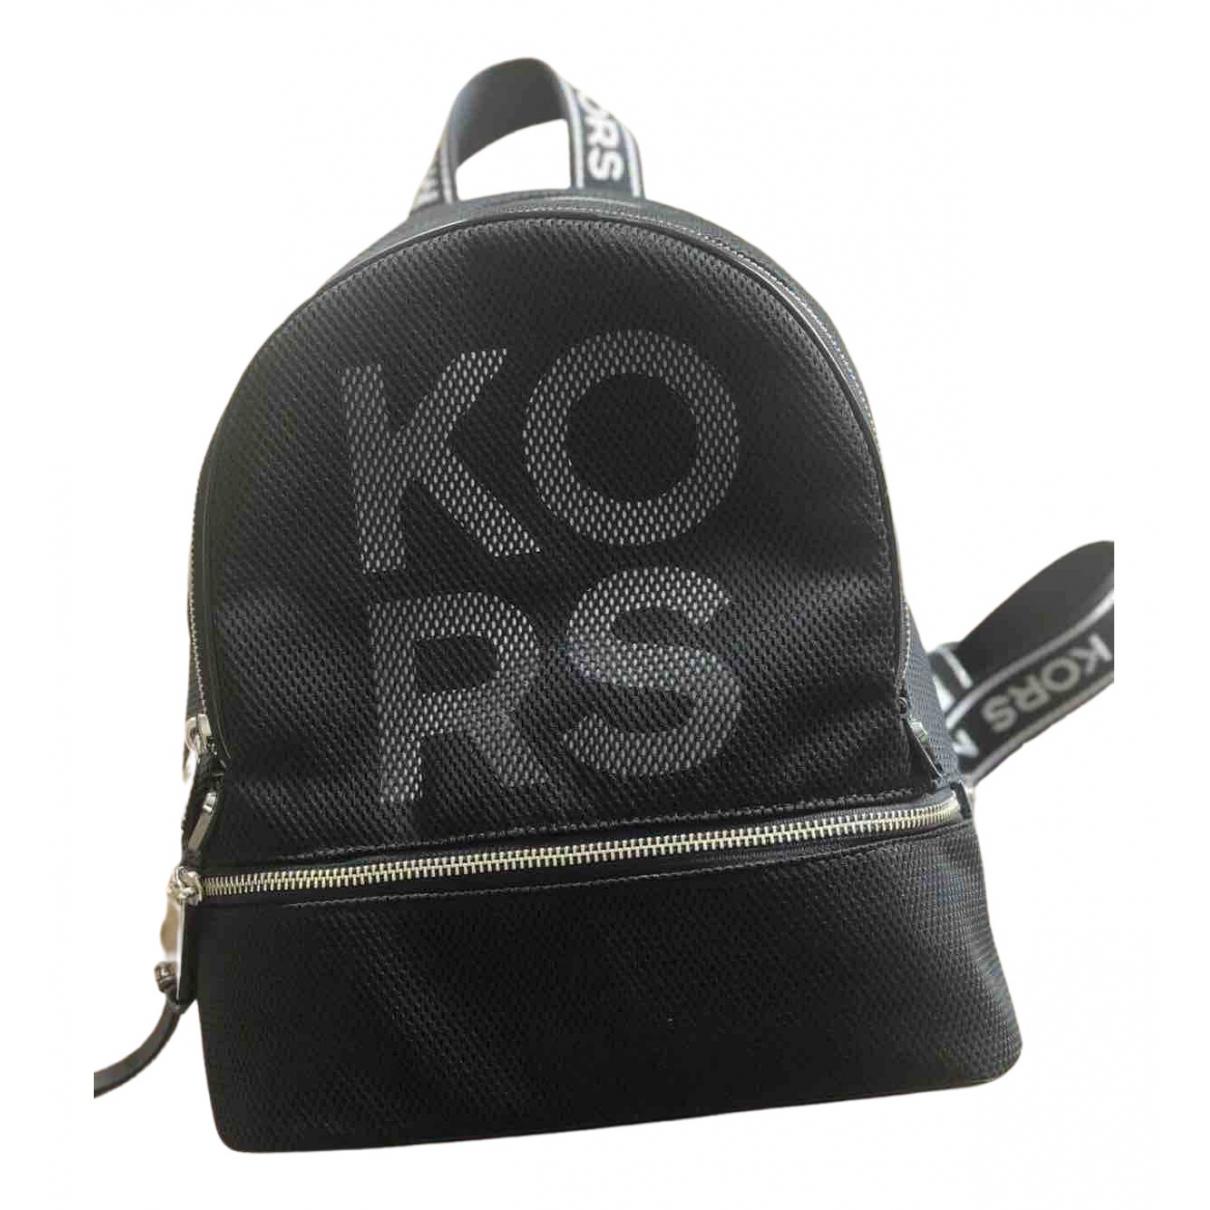 Michael Kors N Black backpack for Women N